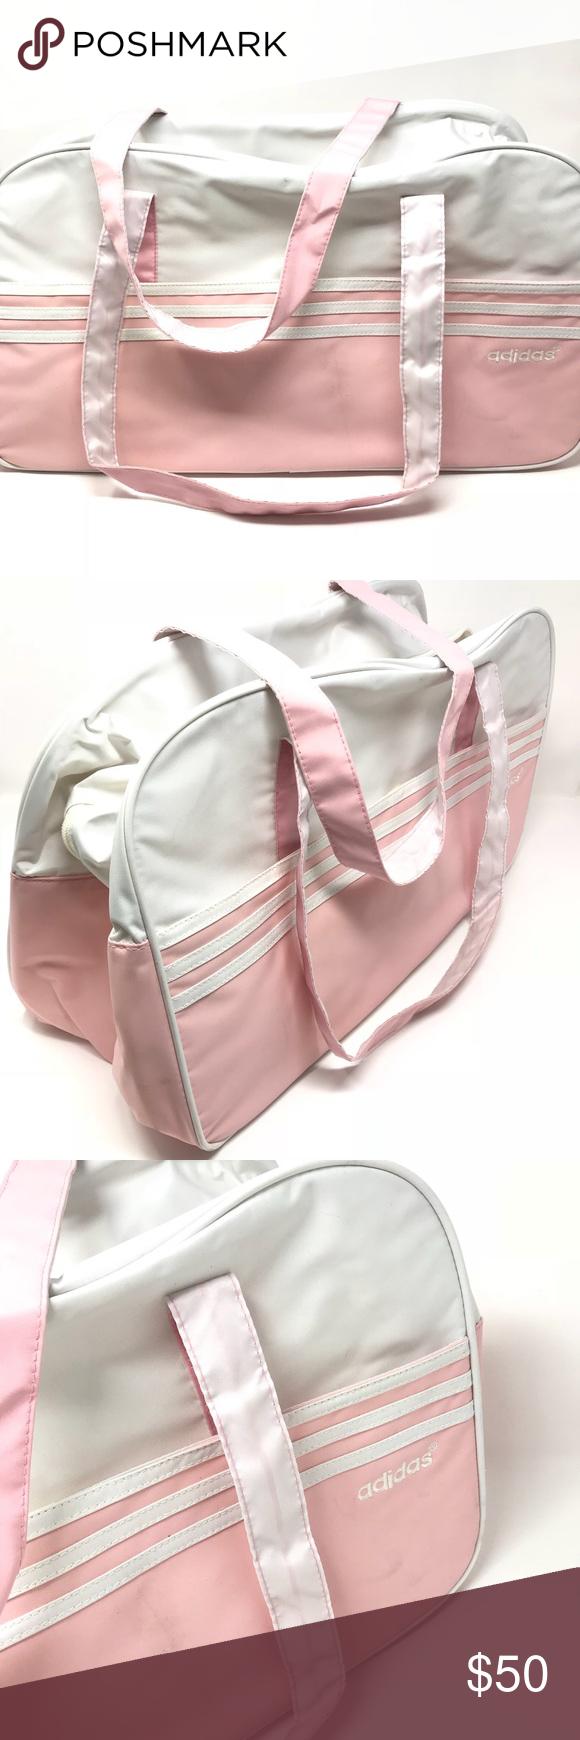 "96719893f EUC Adidas Light Pink & White 3 Stripe Gym Bag EUC Adidas Light Pink &  White 3 Stripe Gym Bag B156 // 20"" Length, 10.5"" Height • 12"" strap drop •  9"" ..."